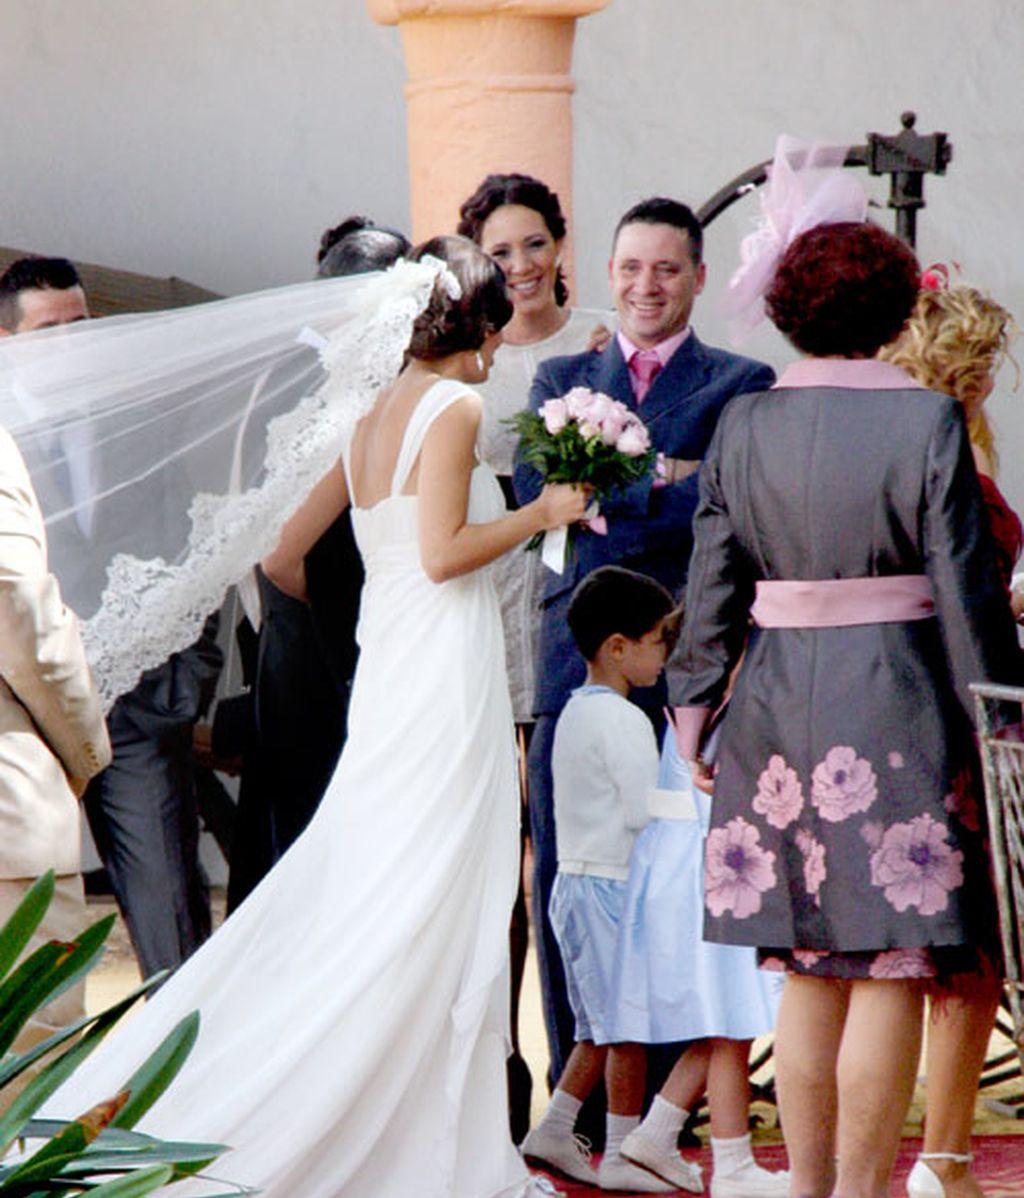 La boda de Morante de la Puebla